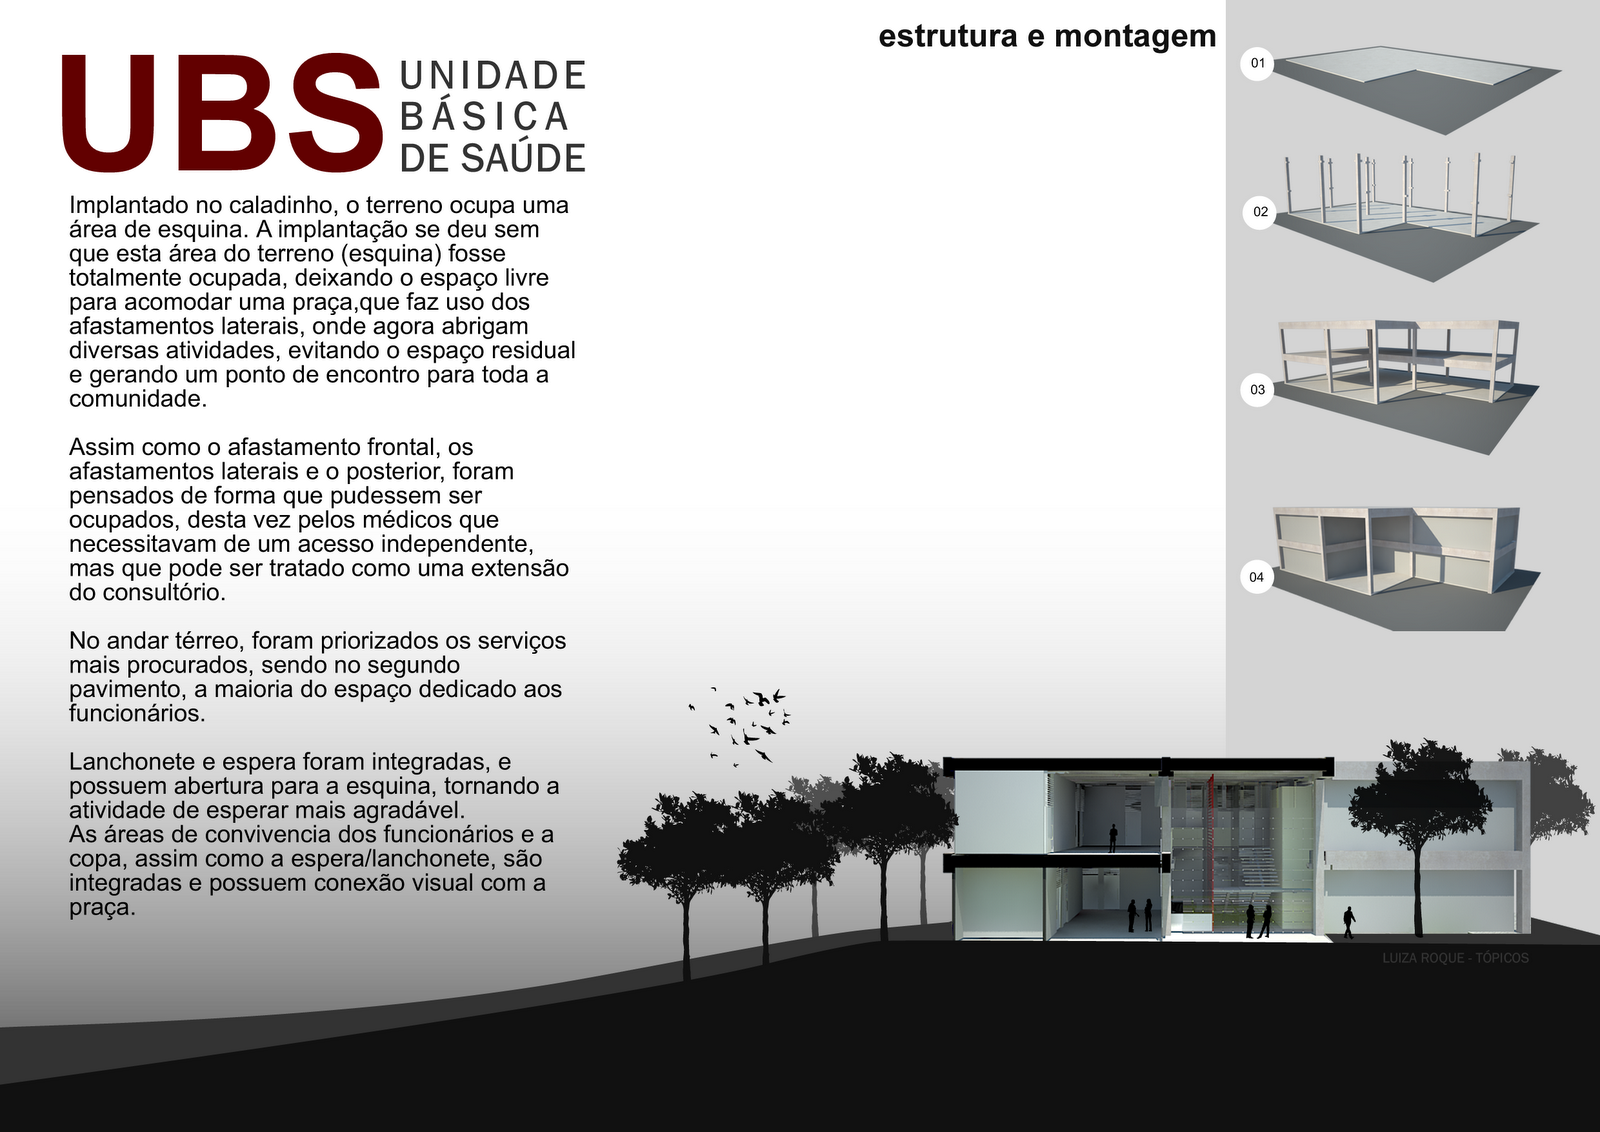 UBS - Unidade básica de saúde